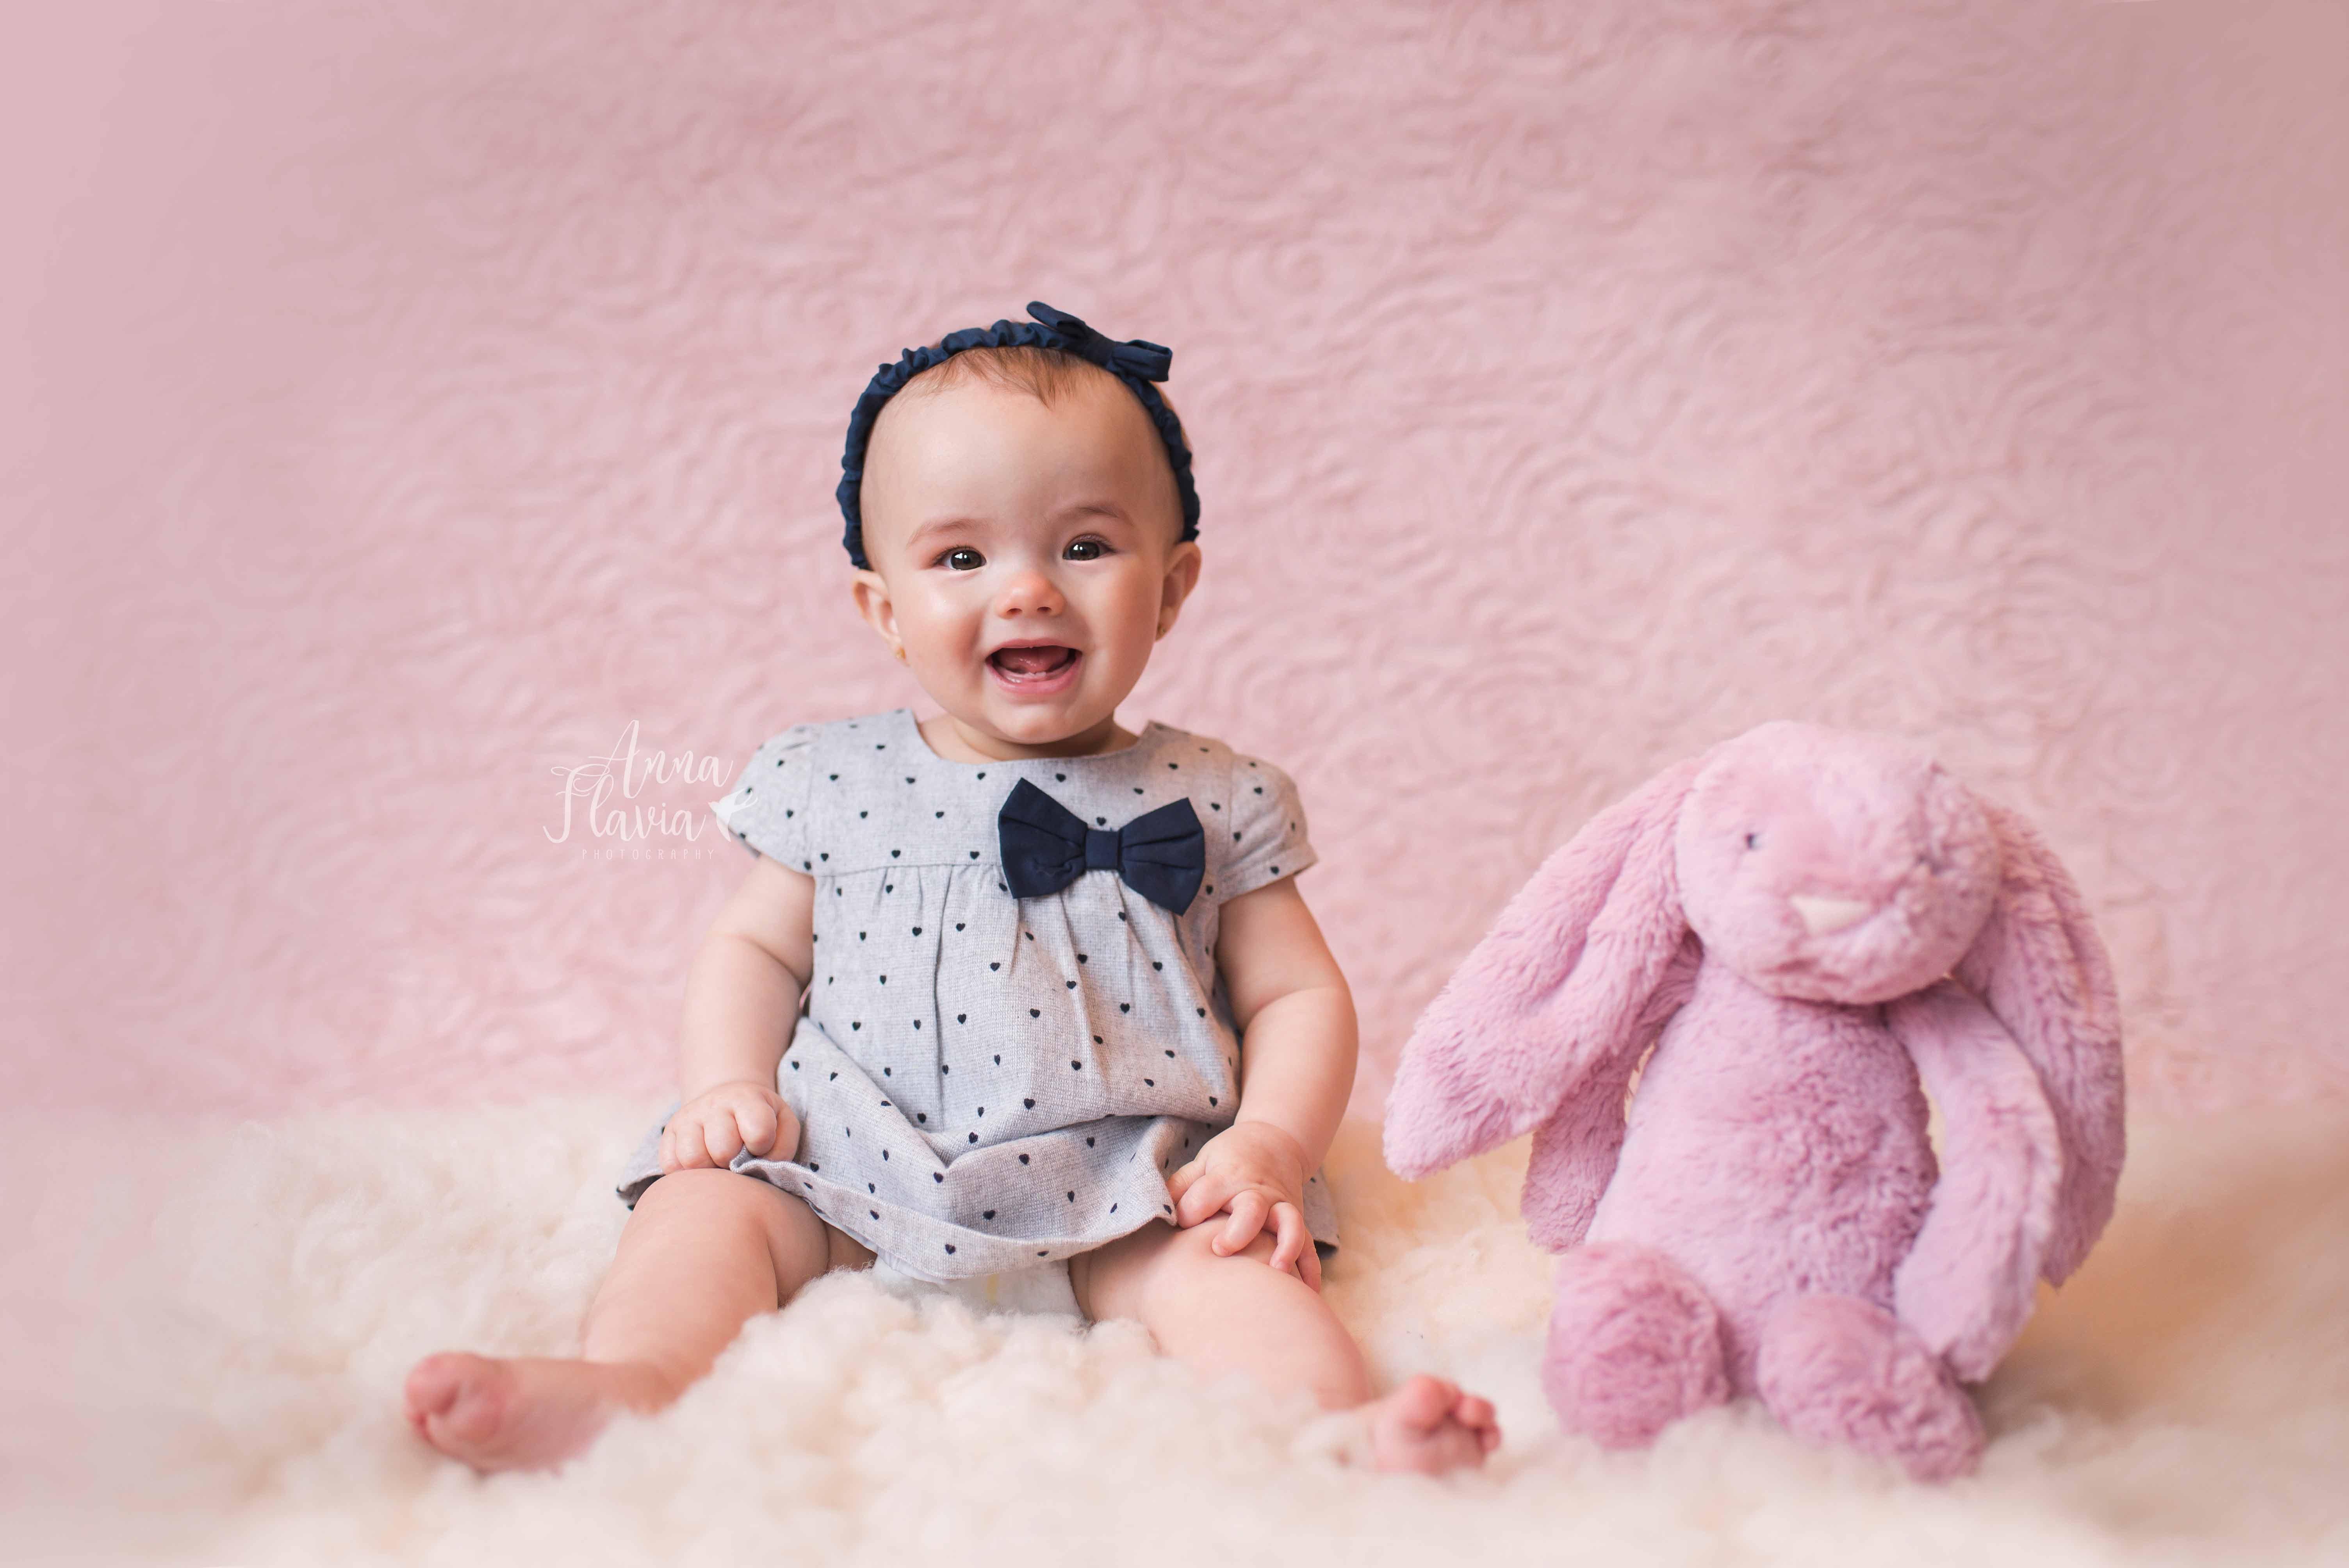 photographer_dublin_anna_flavia_children_baby_newborn_family_20